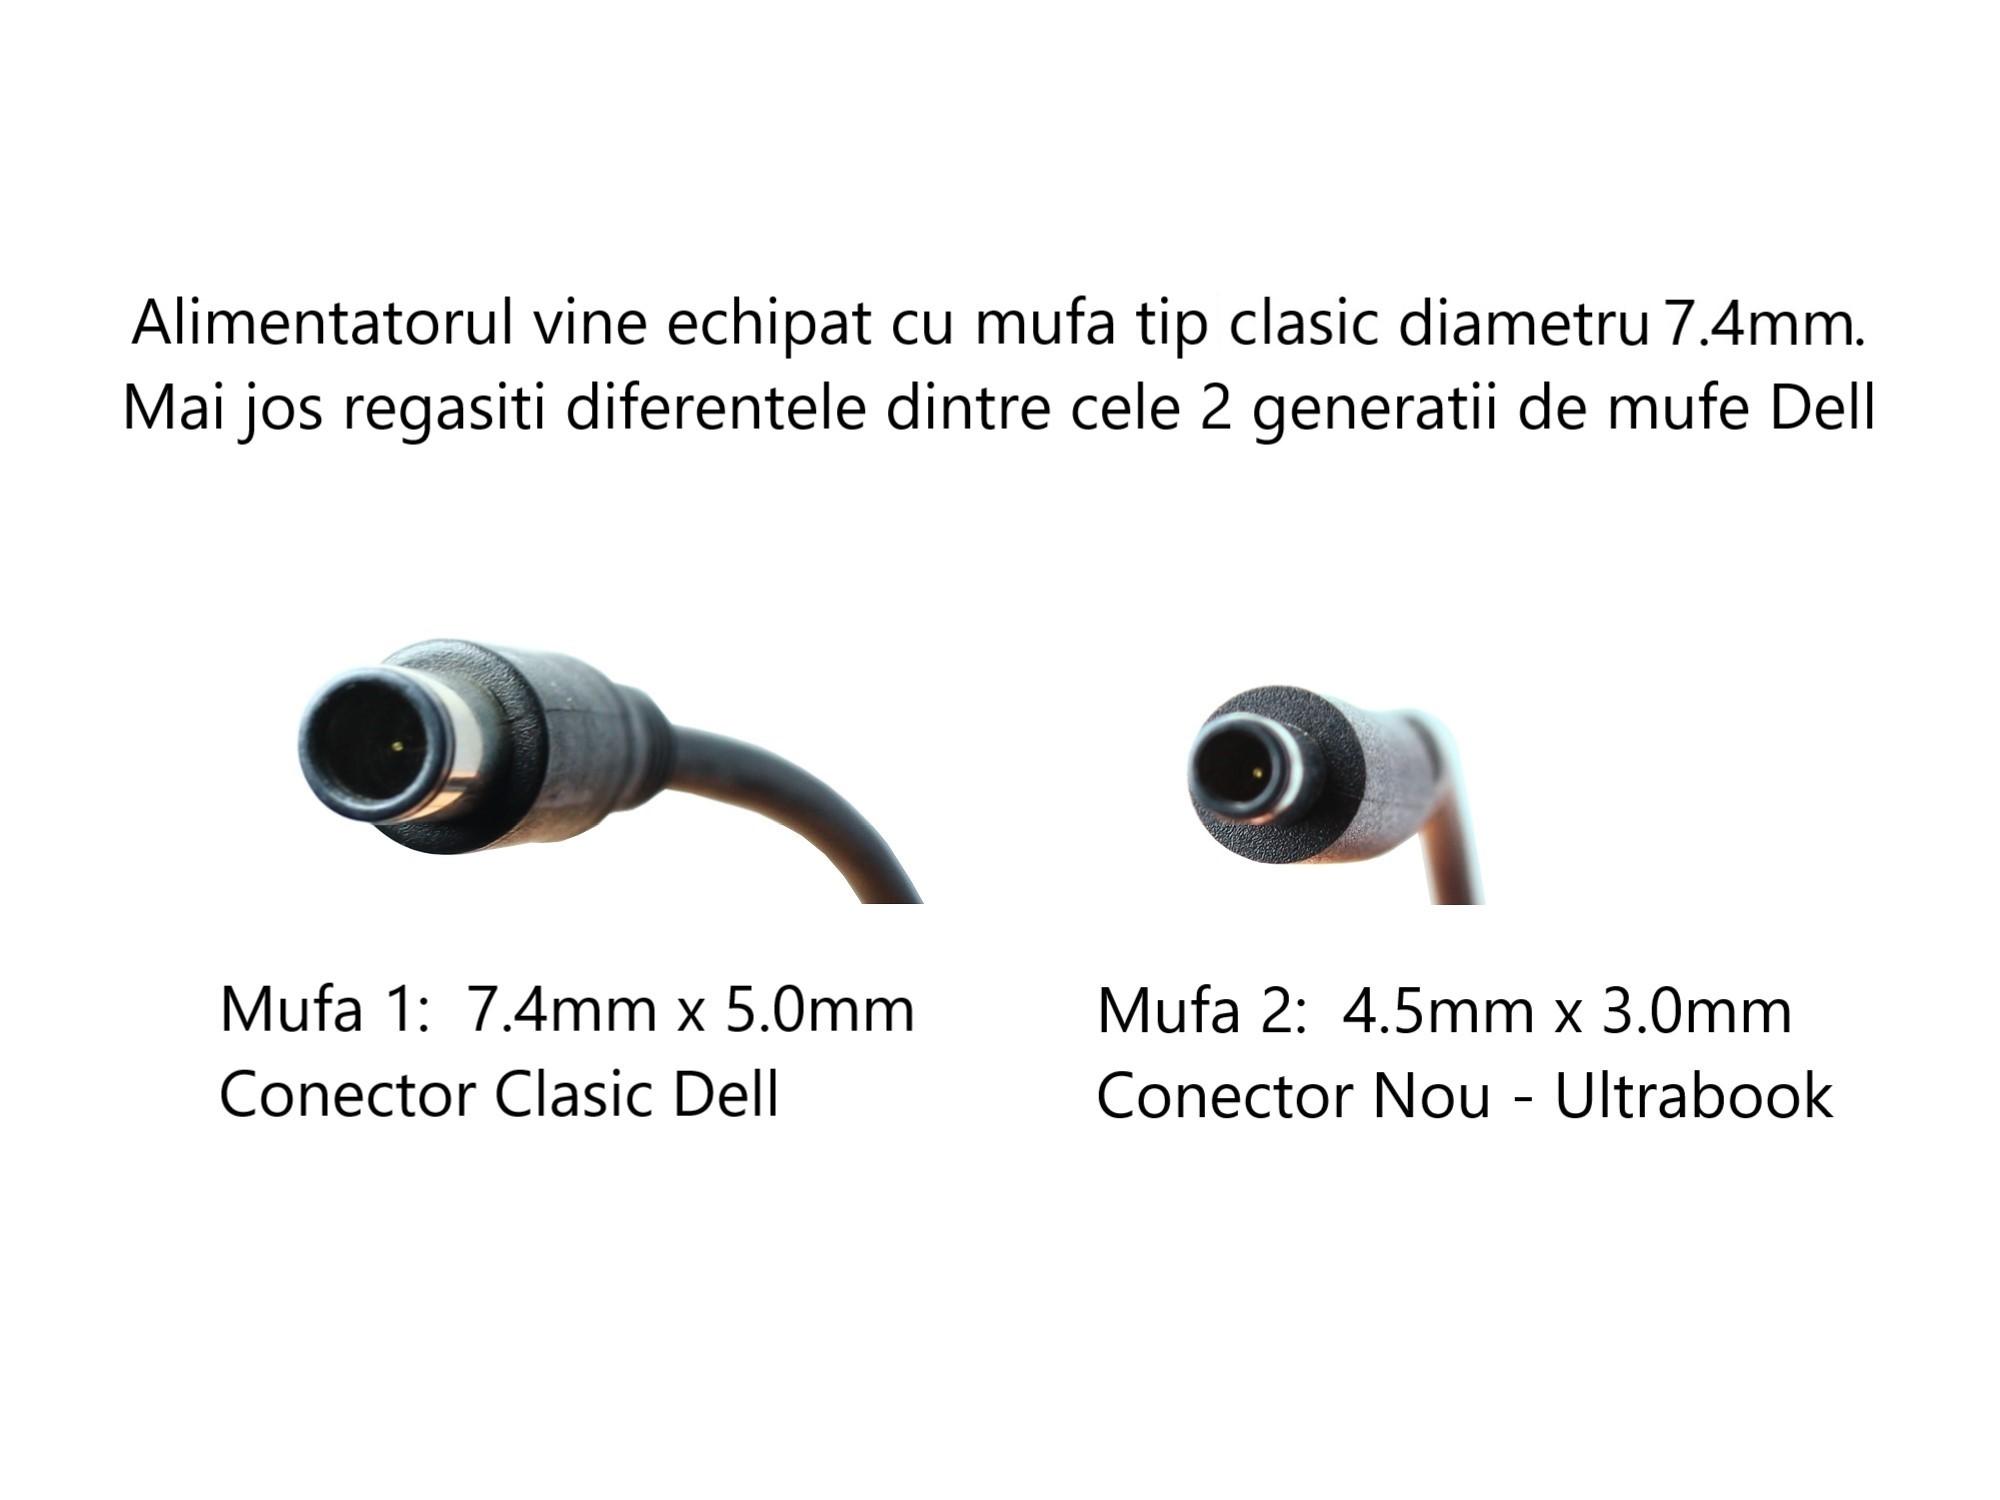 Incarcator original laptop Dell Latitude 5401, 5491, 5501, 5591, E6400, E6440, E6500, E6540, 130W, 19.5V, 6.67A, mufa 7.4mm, varianta clasica